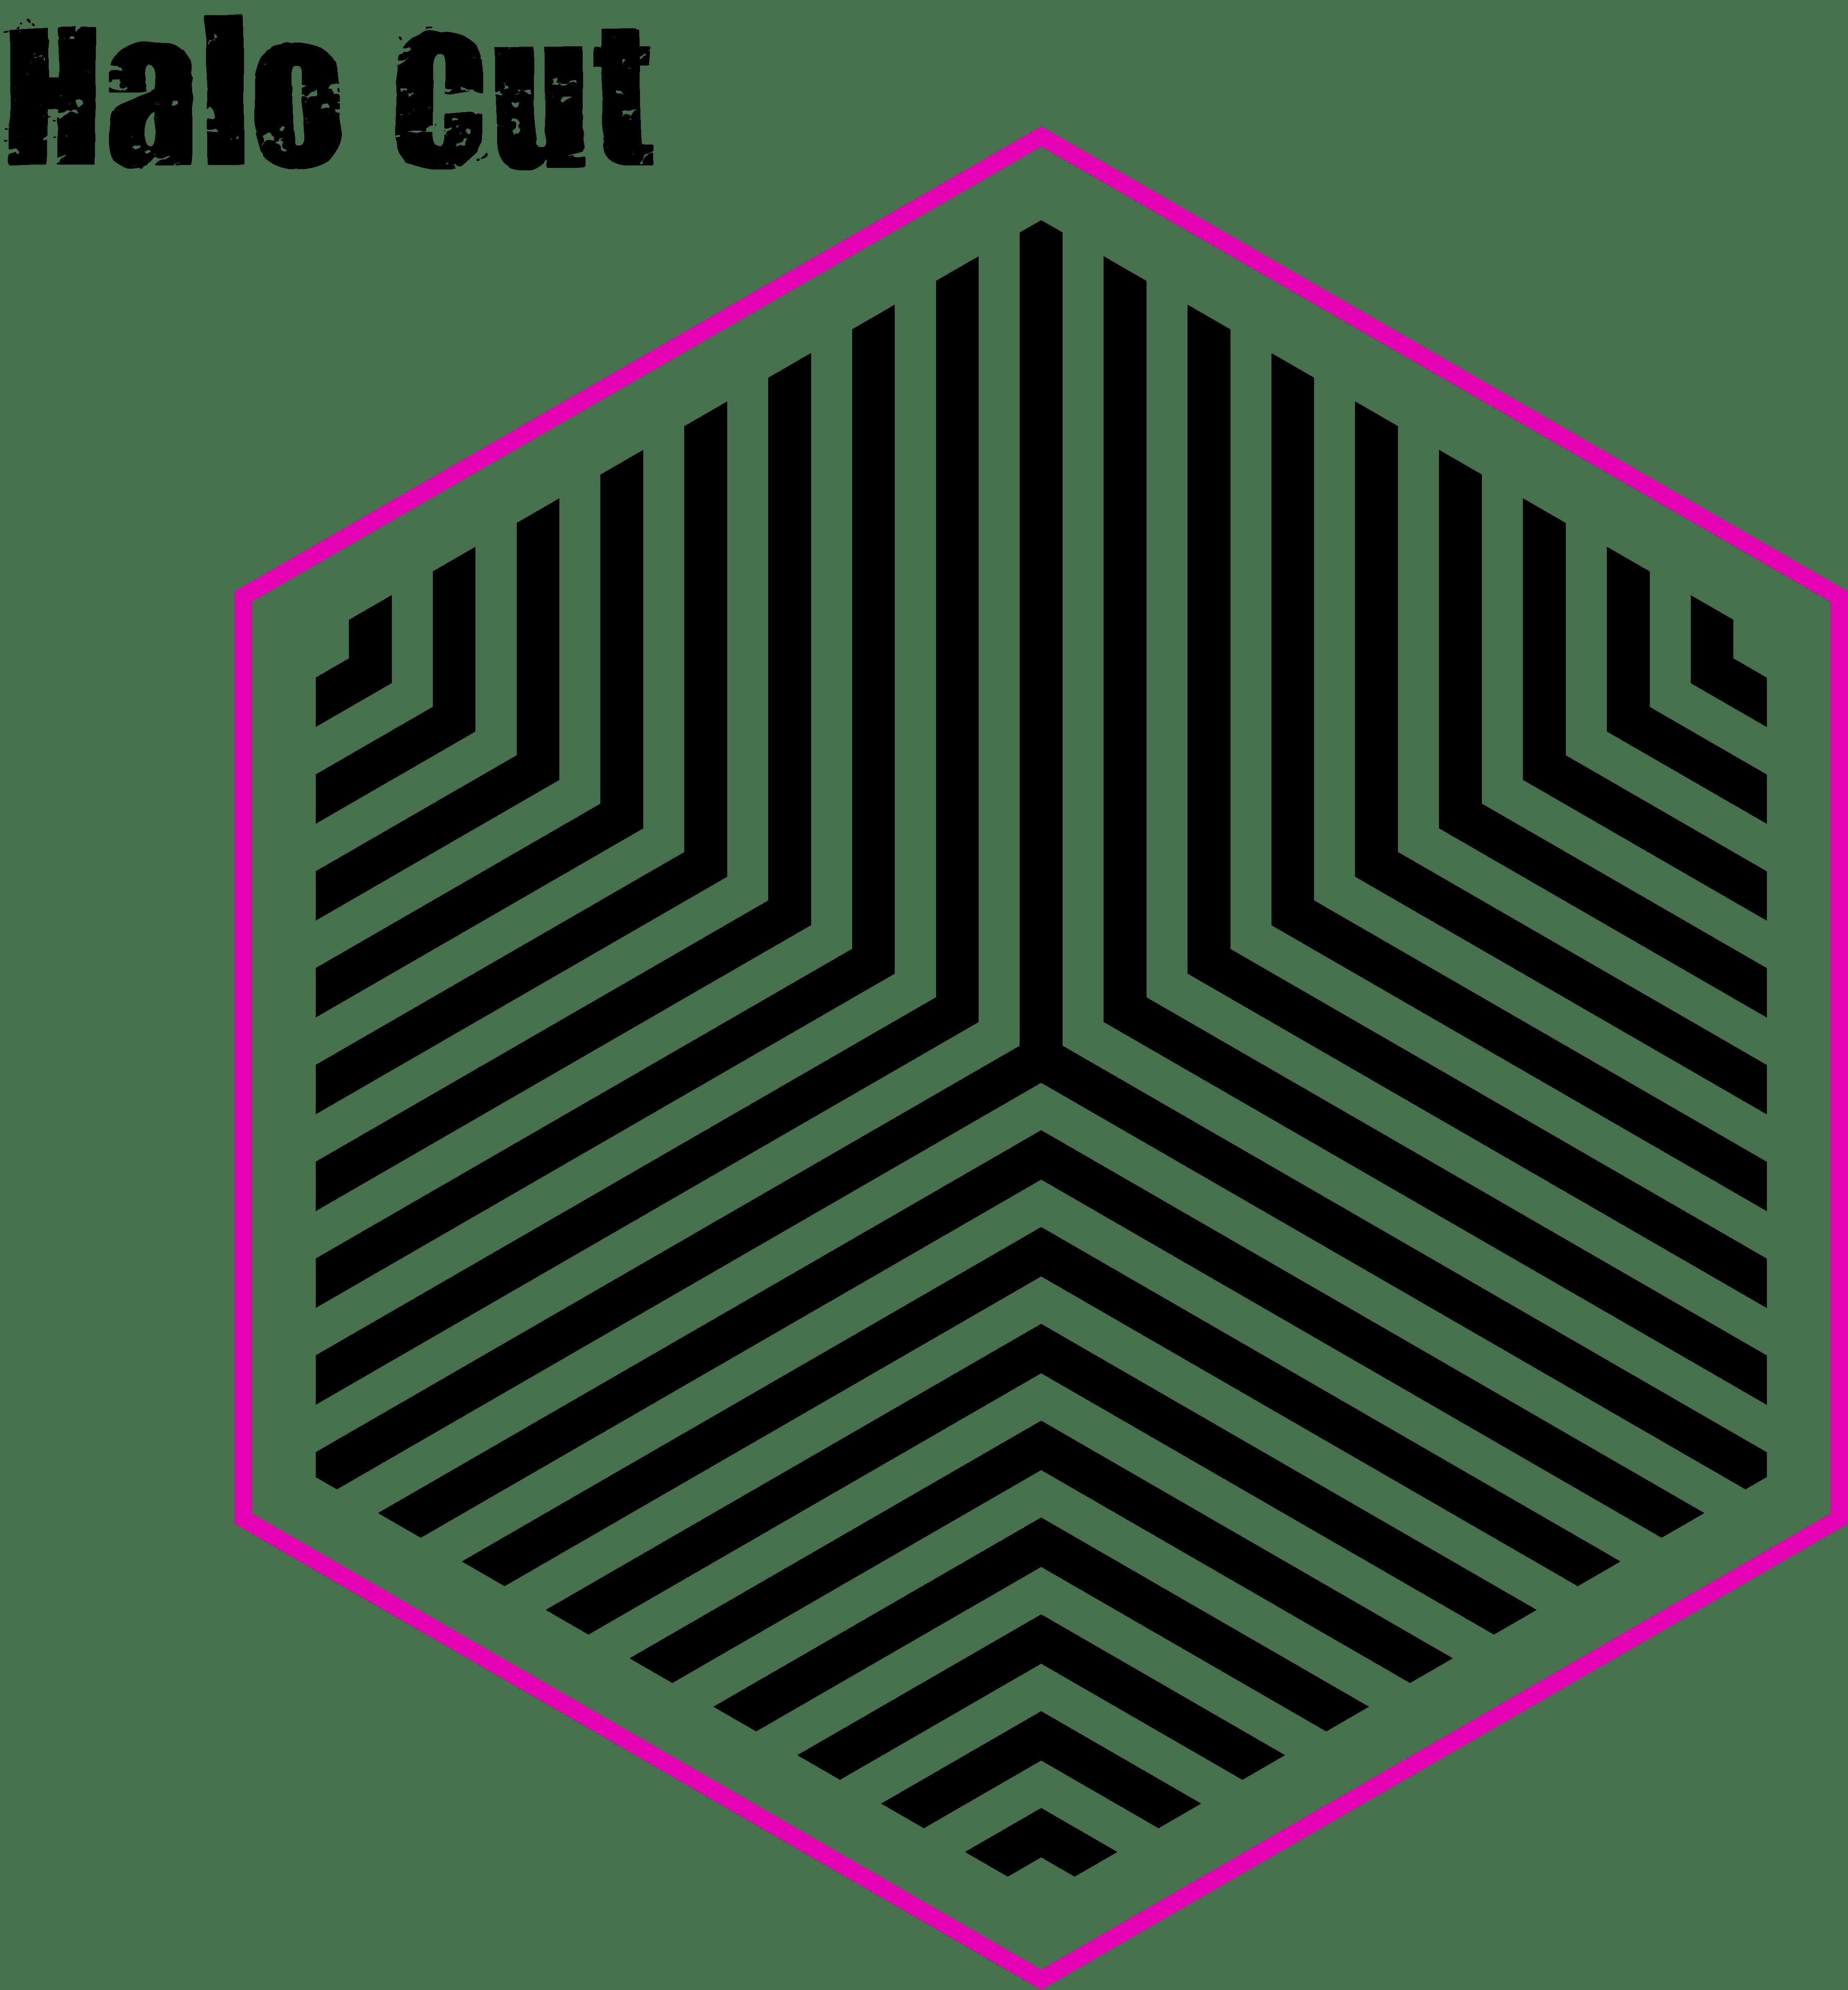 halo cut design